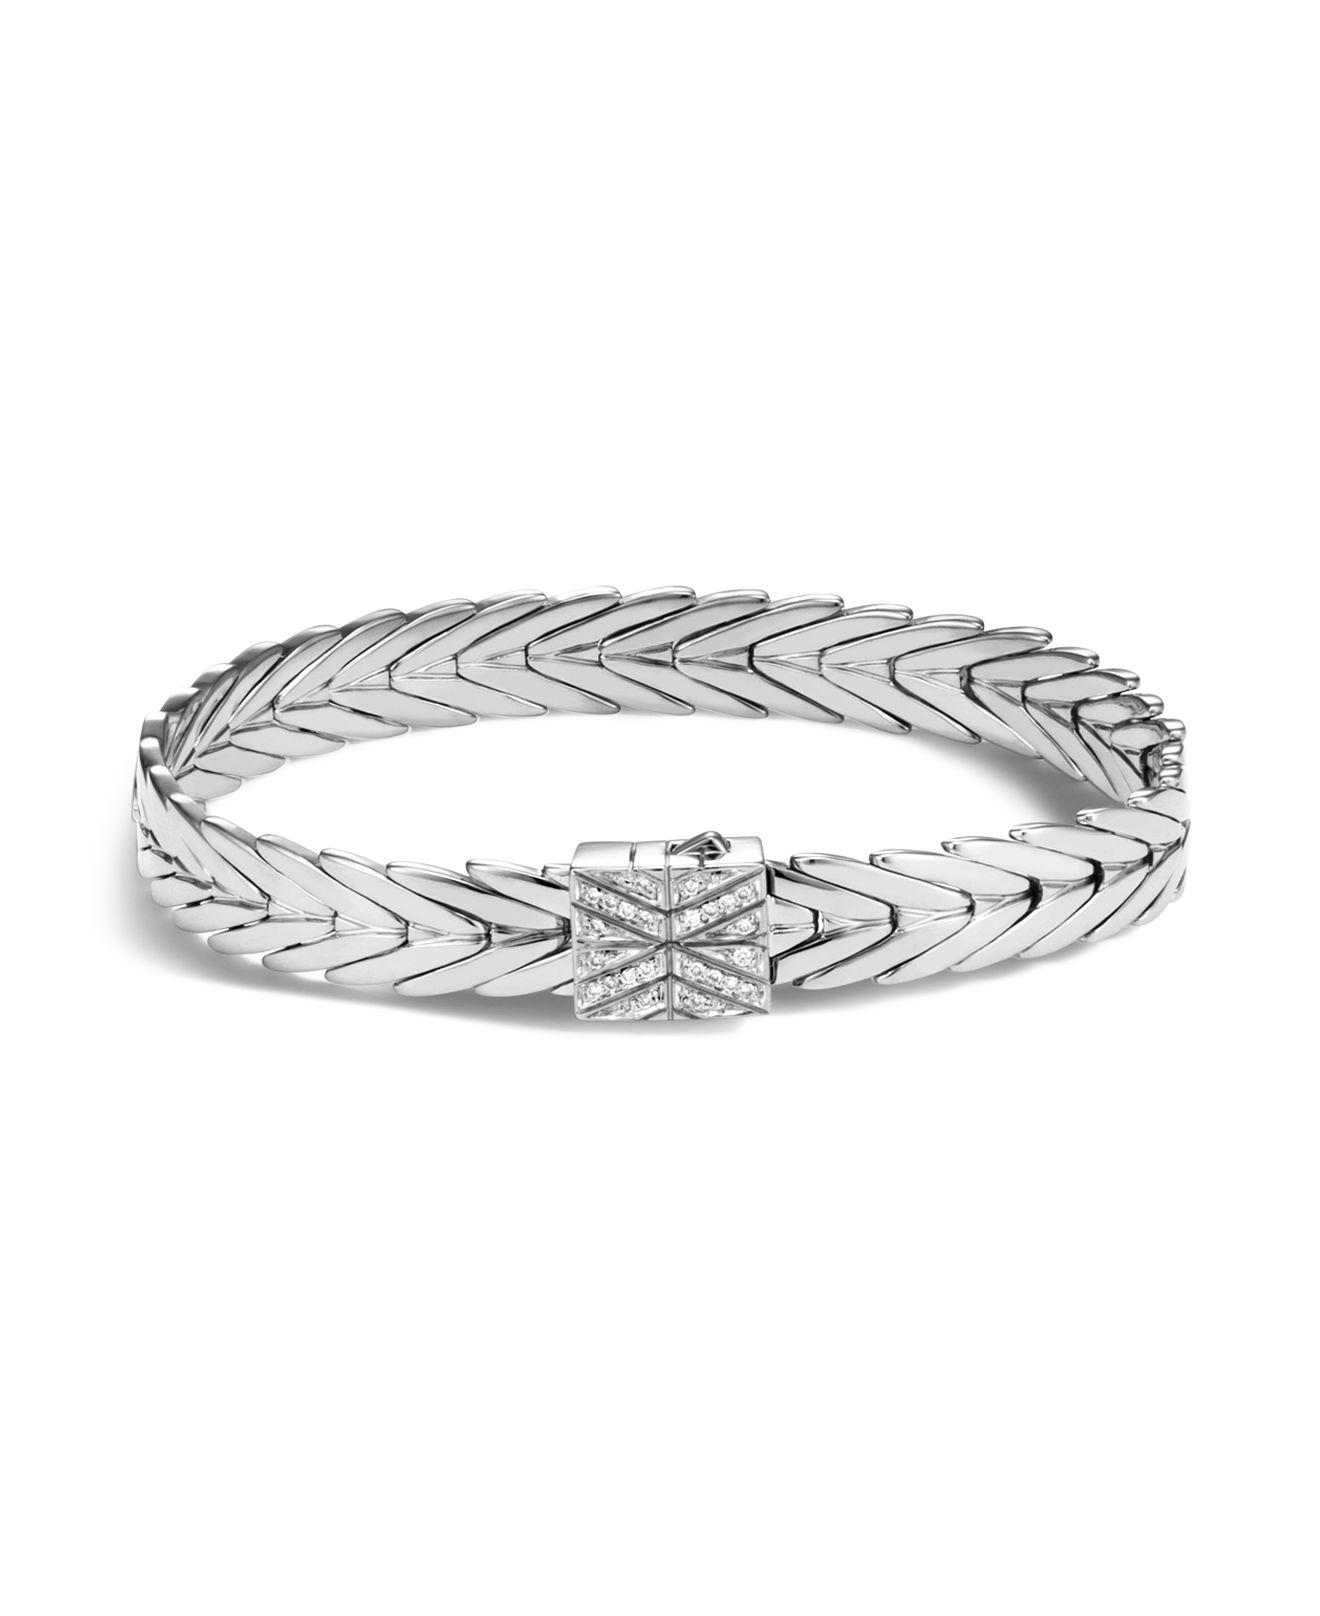 John Hardy Modern Chain Small Hinged Bangle Bracelet WNJY1tHkd